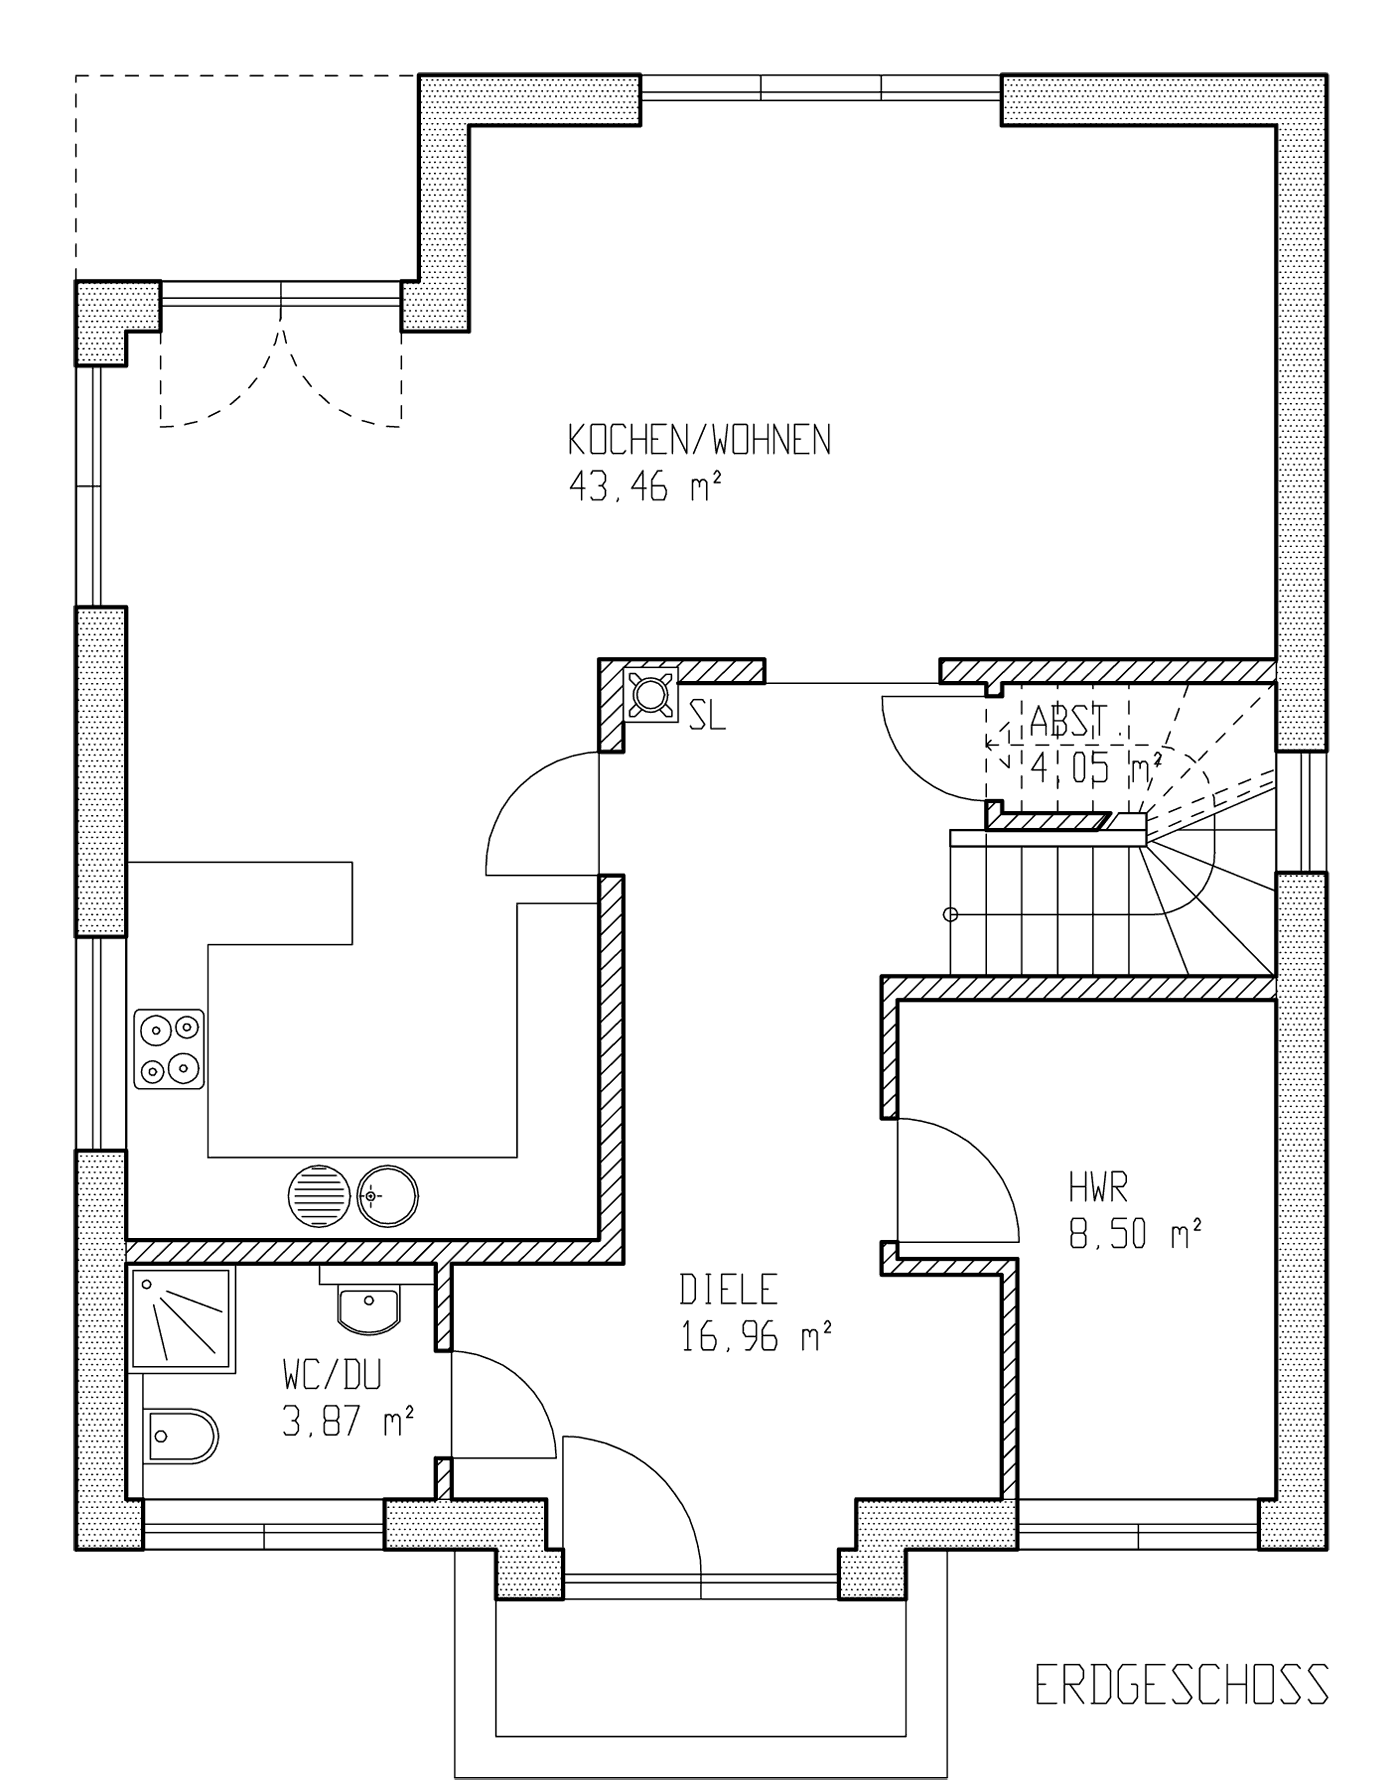 bauhaus-flachdach-grundriss-eg